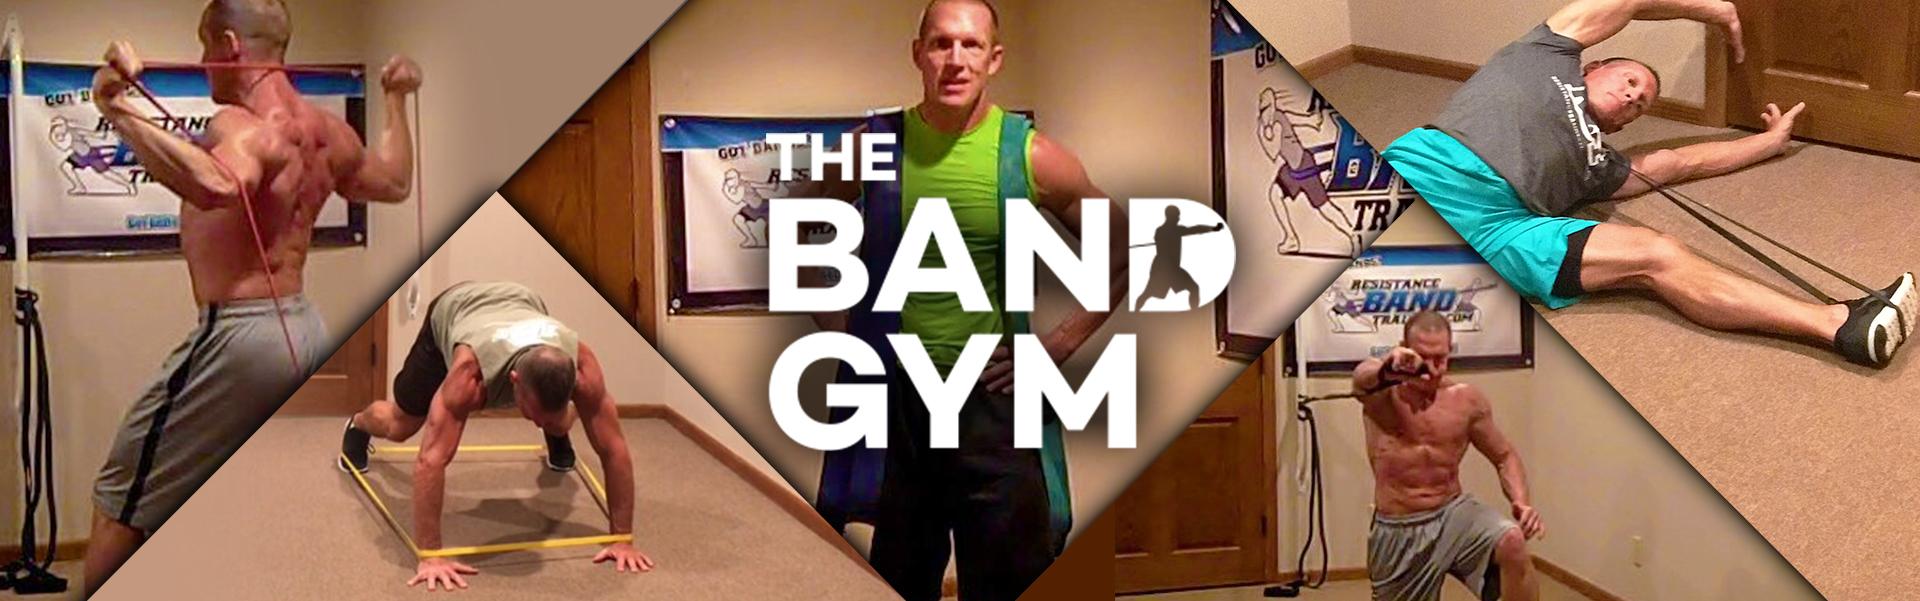 Band Gym Header - Resistance Band Training